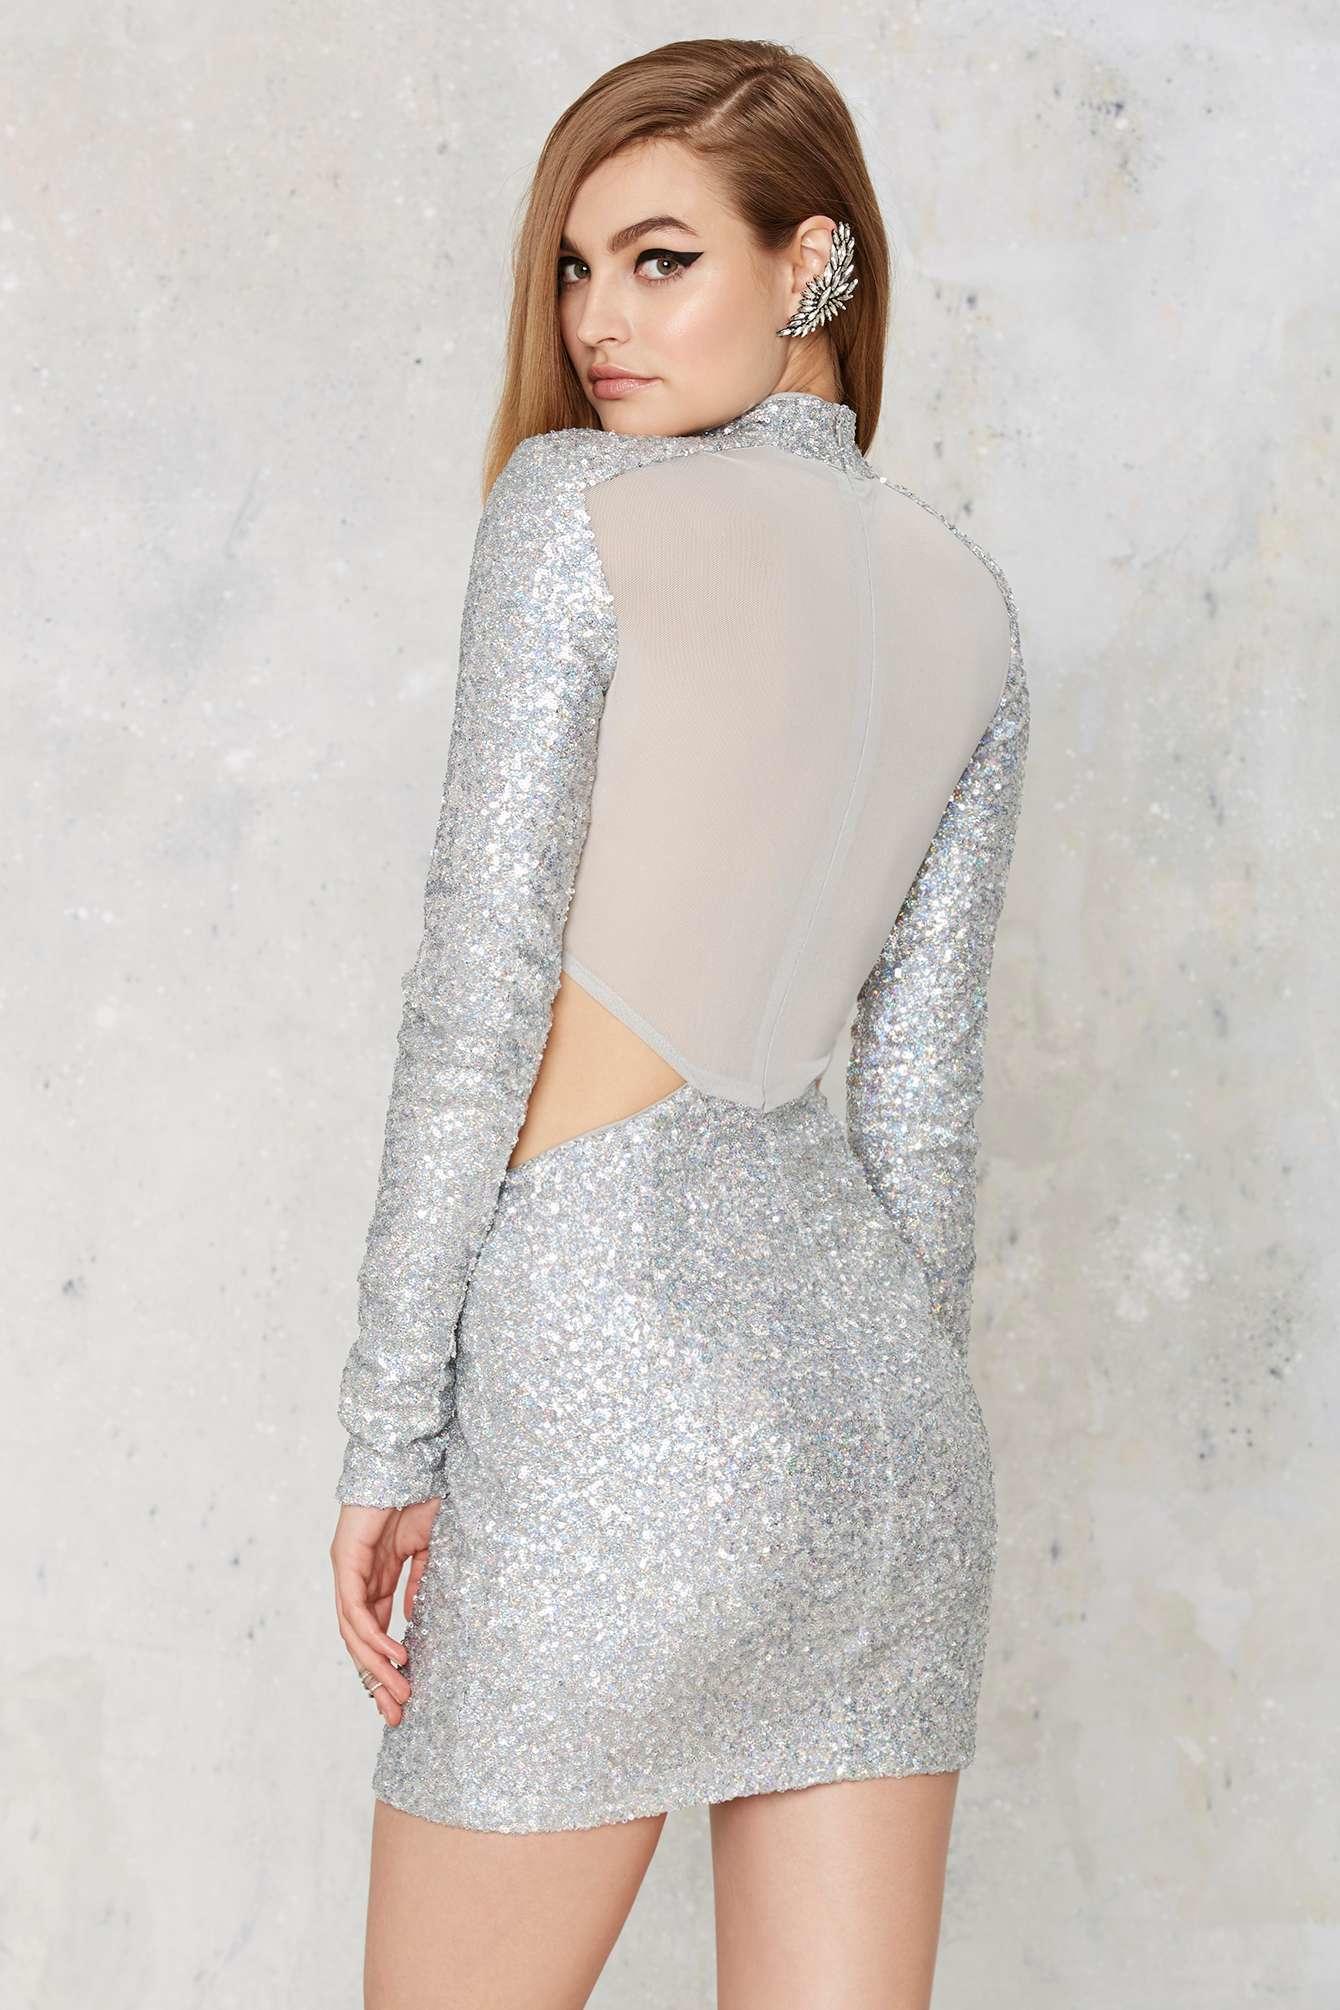 cb29b19548 Lyst - Nasty Gal Take A Shine Sequin Cutout Dress in Metallic